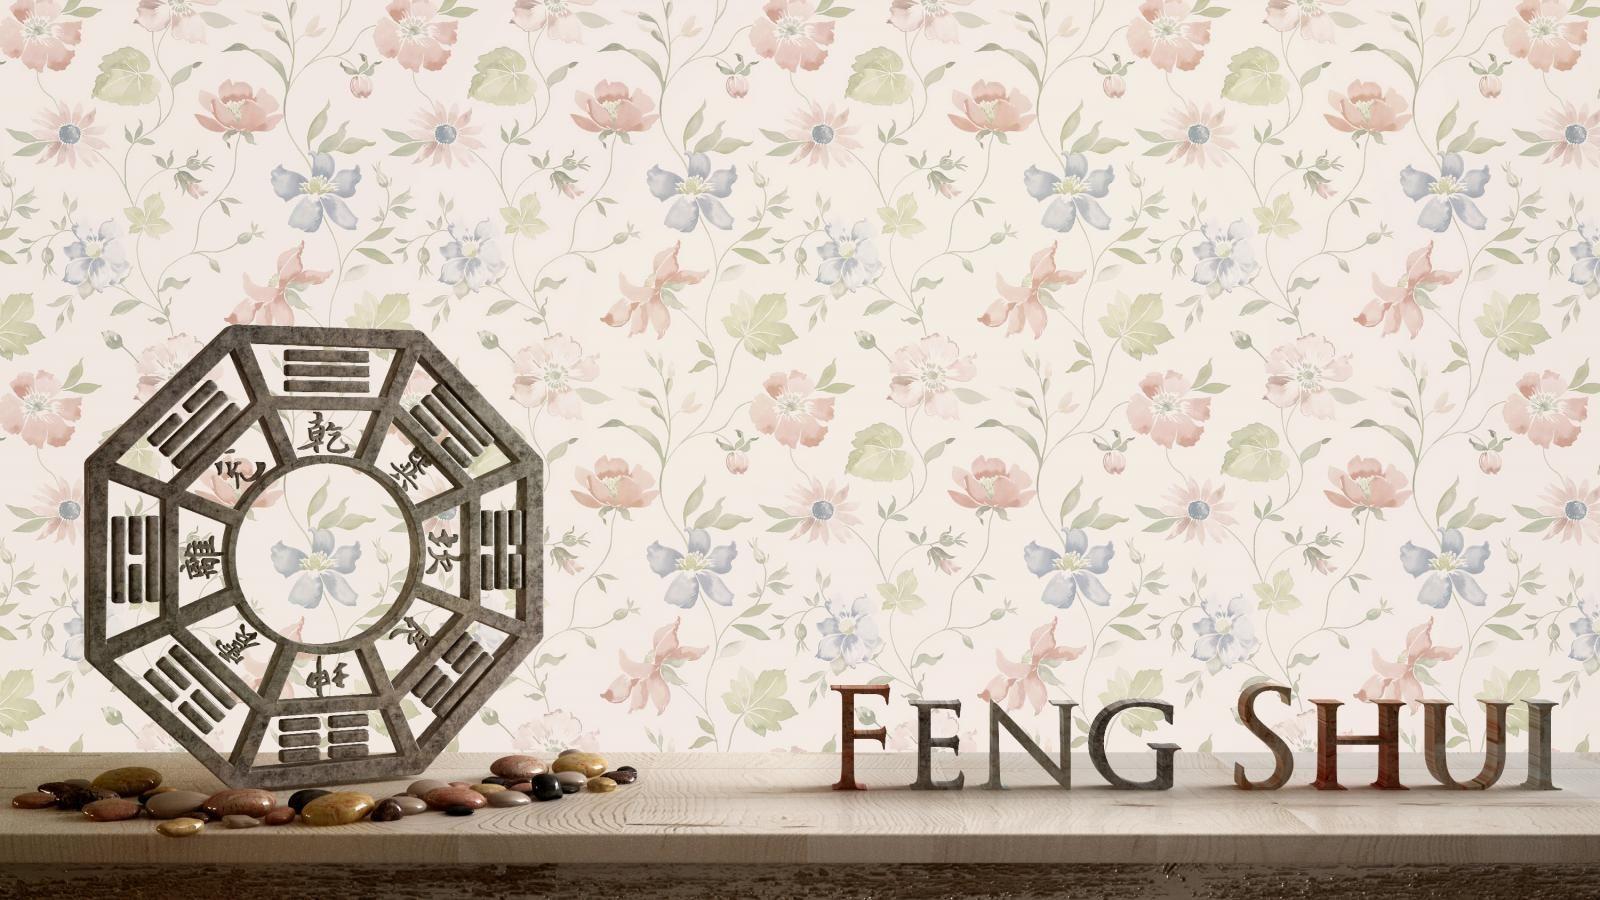 Como Encontrar El Amor Segun El Feng Shui Causas De La Mala Suerte Segun El Feng Shui Feng Shui Bambu De